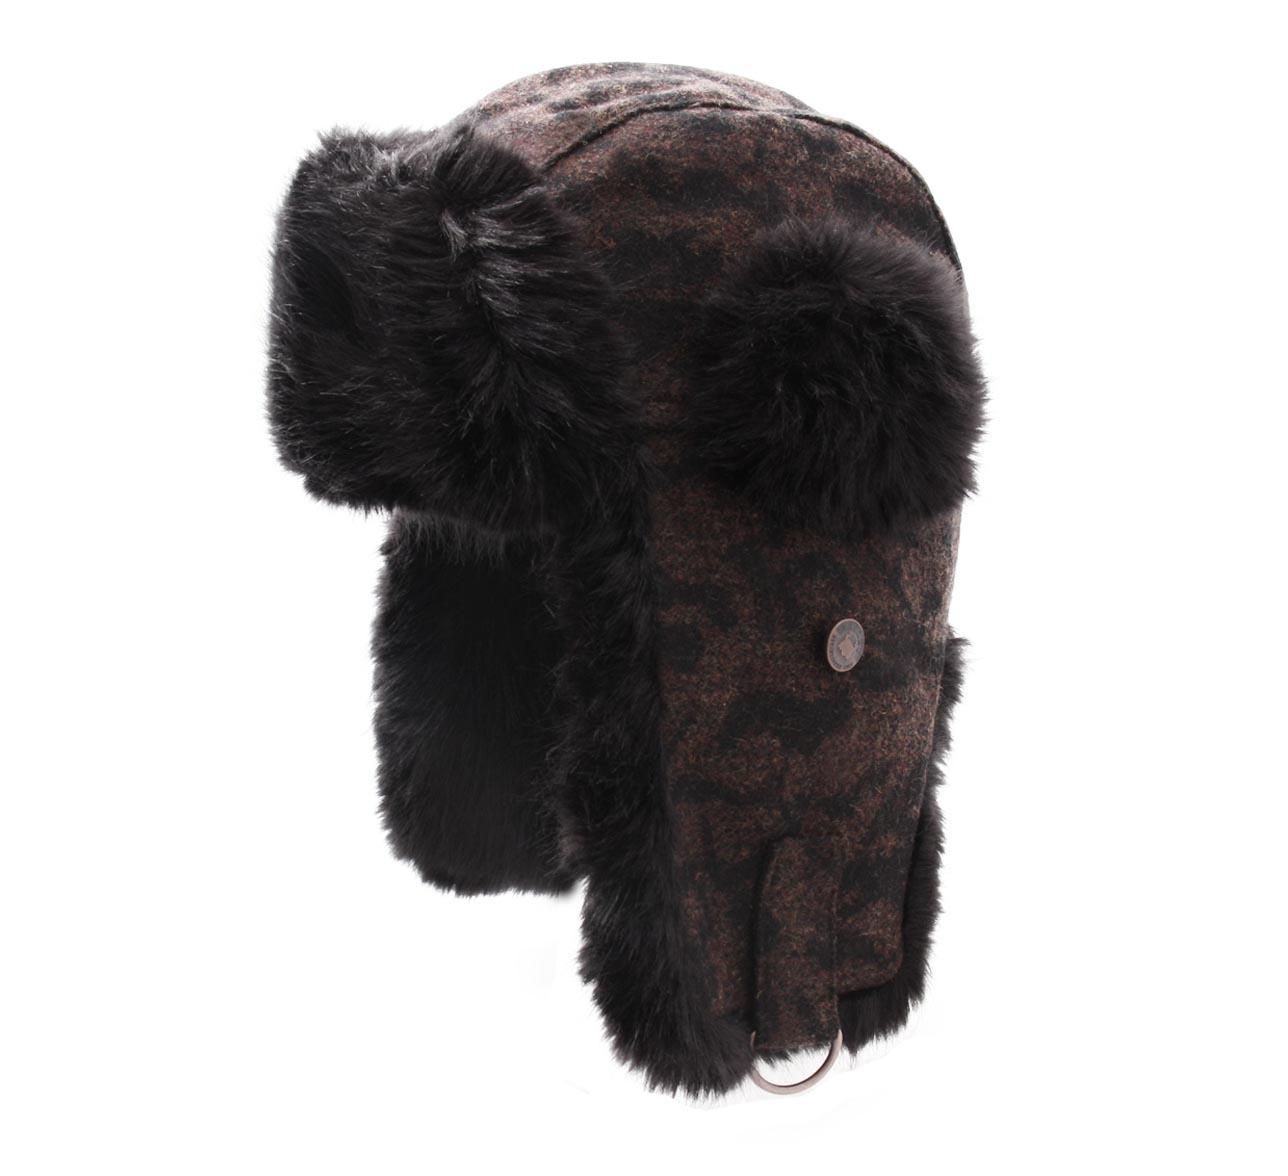 chapka pelham bonnet bailey. Black Bedroom Furniture Sets. Home Design Ideas